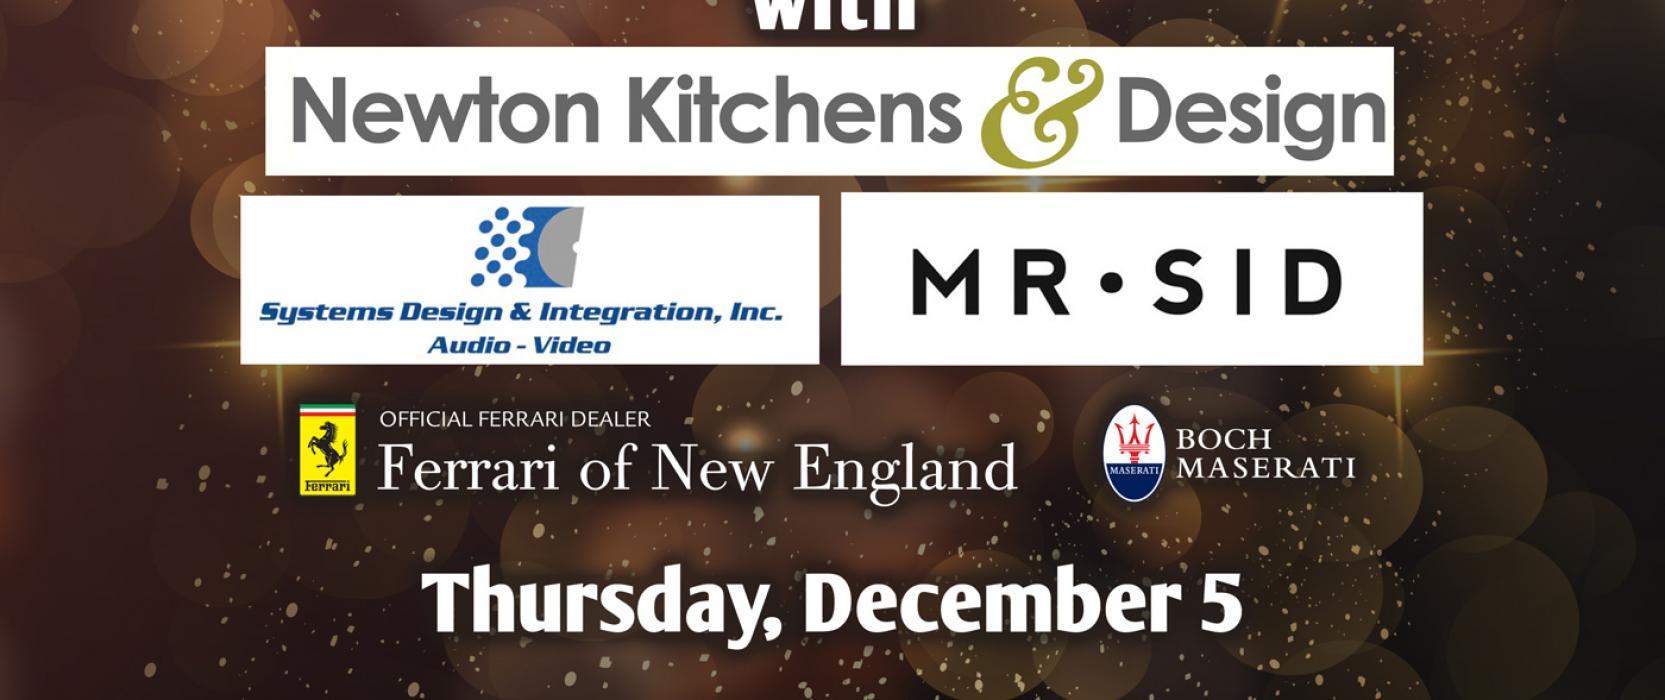 """The Best in Design"" Celebration Dec. 5 at Newton Kitchens & Design"